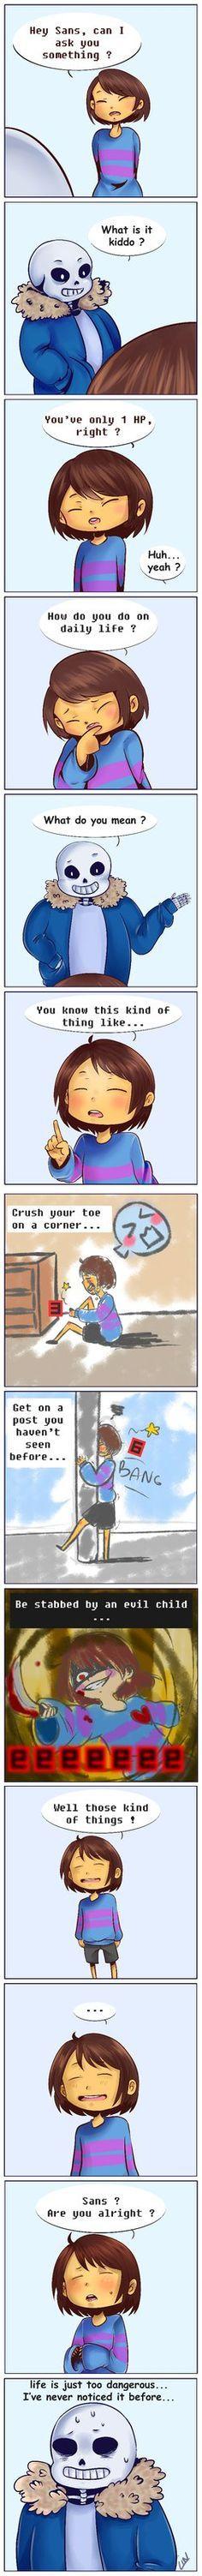 Undertale comic - Life is so dangerous XD